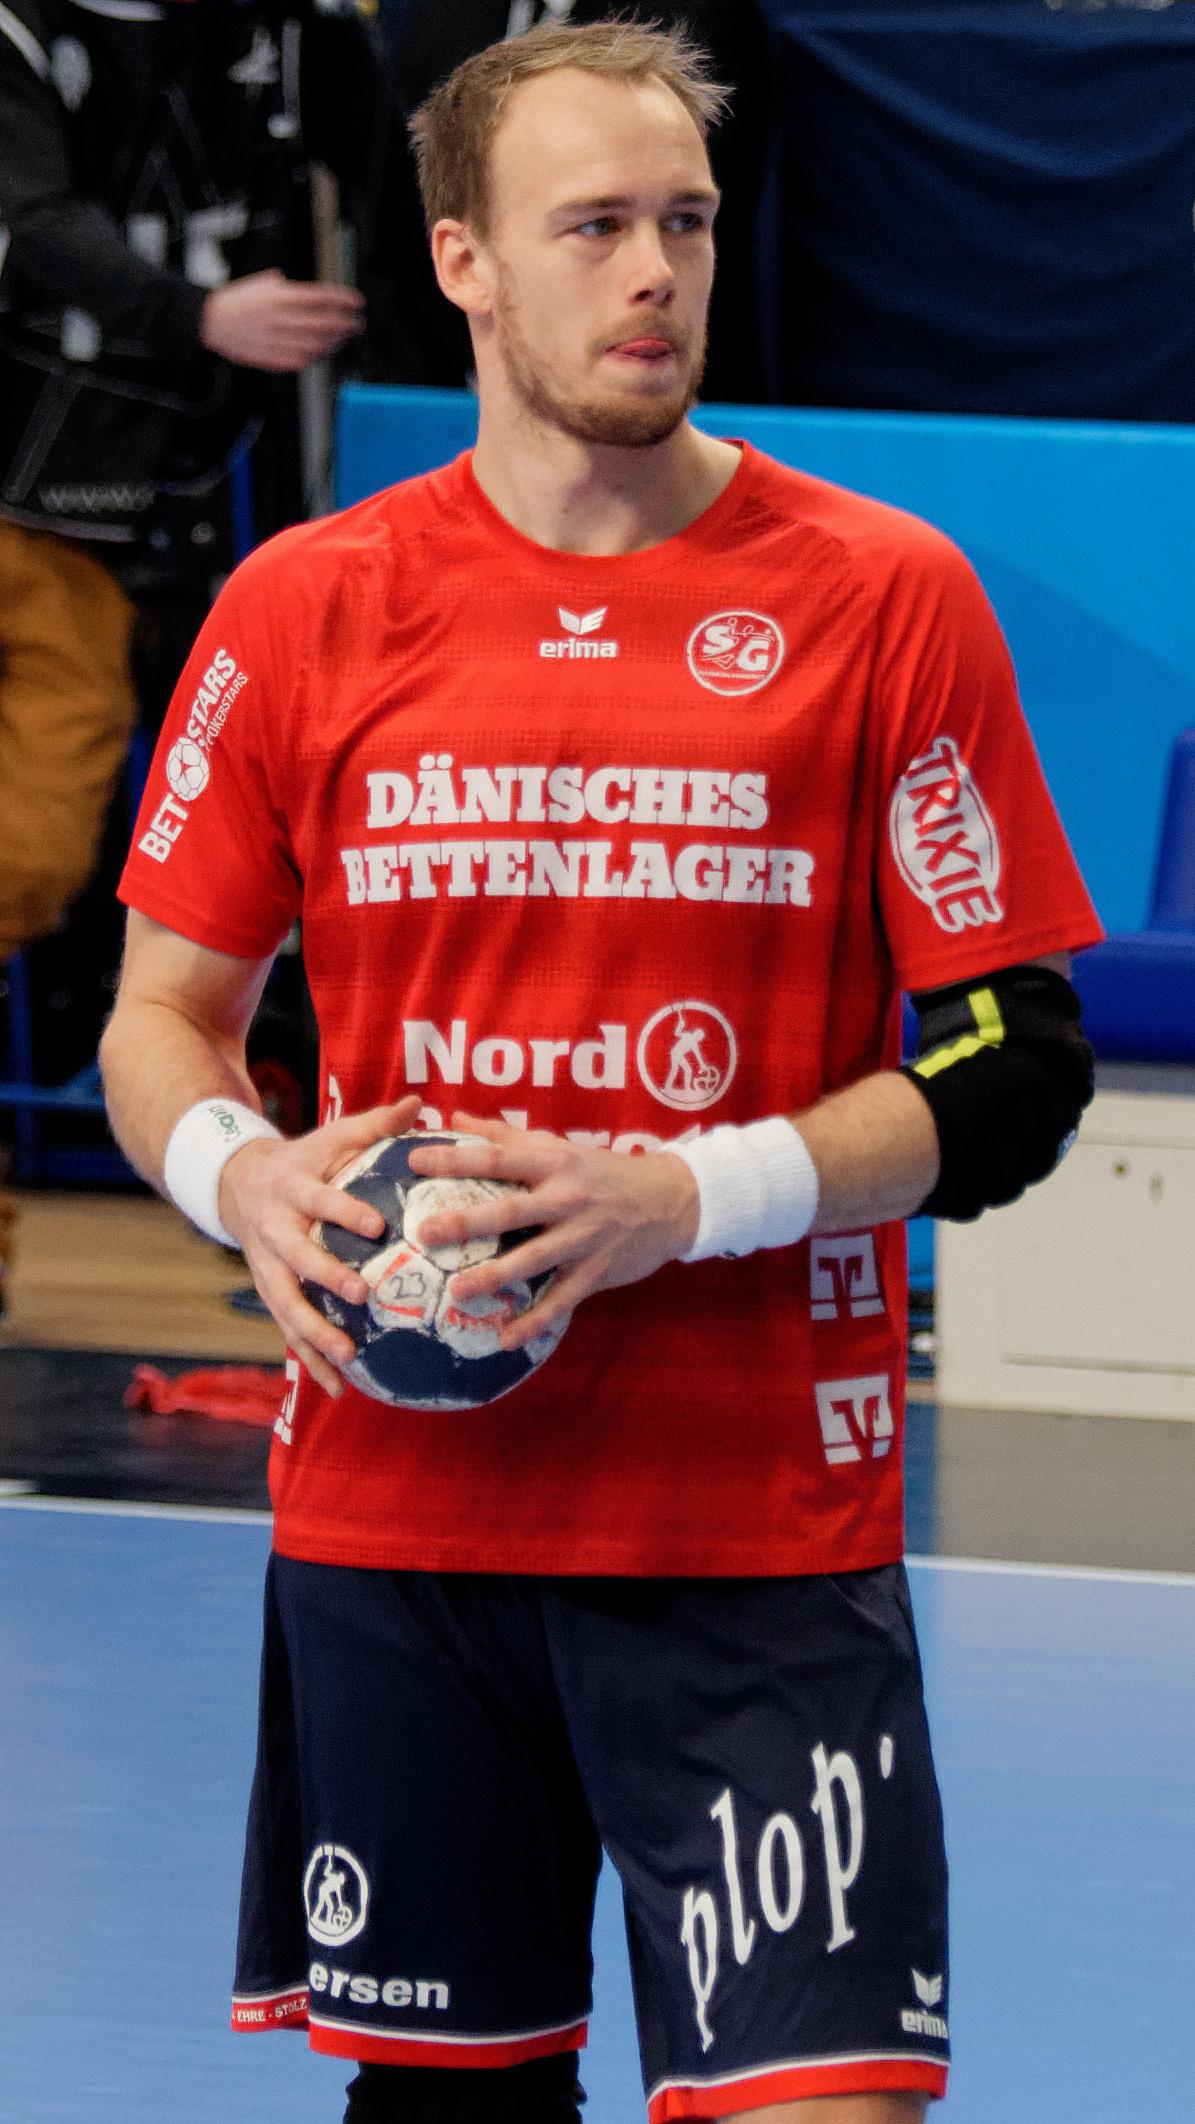 Henrik Toft Hansen